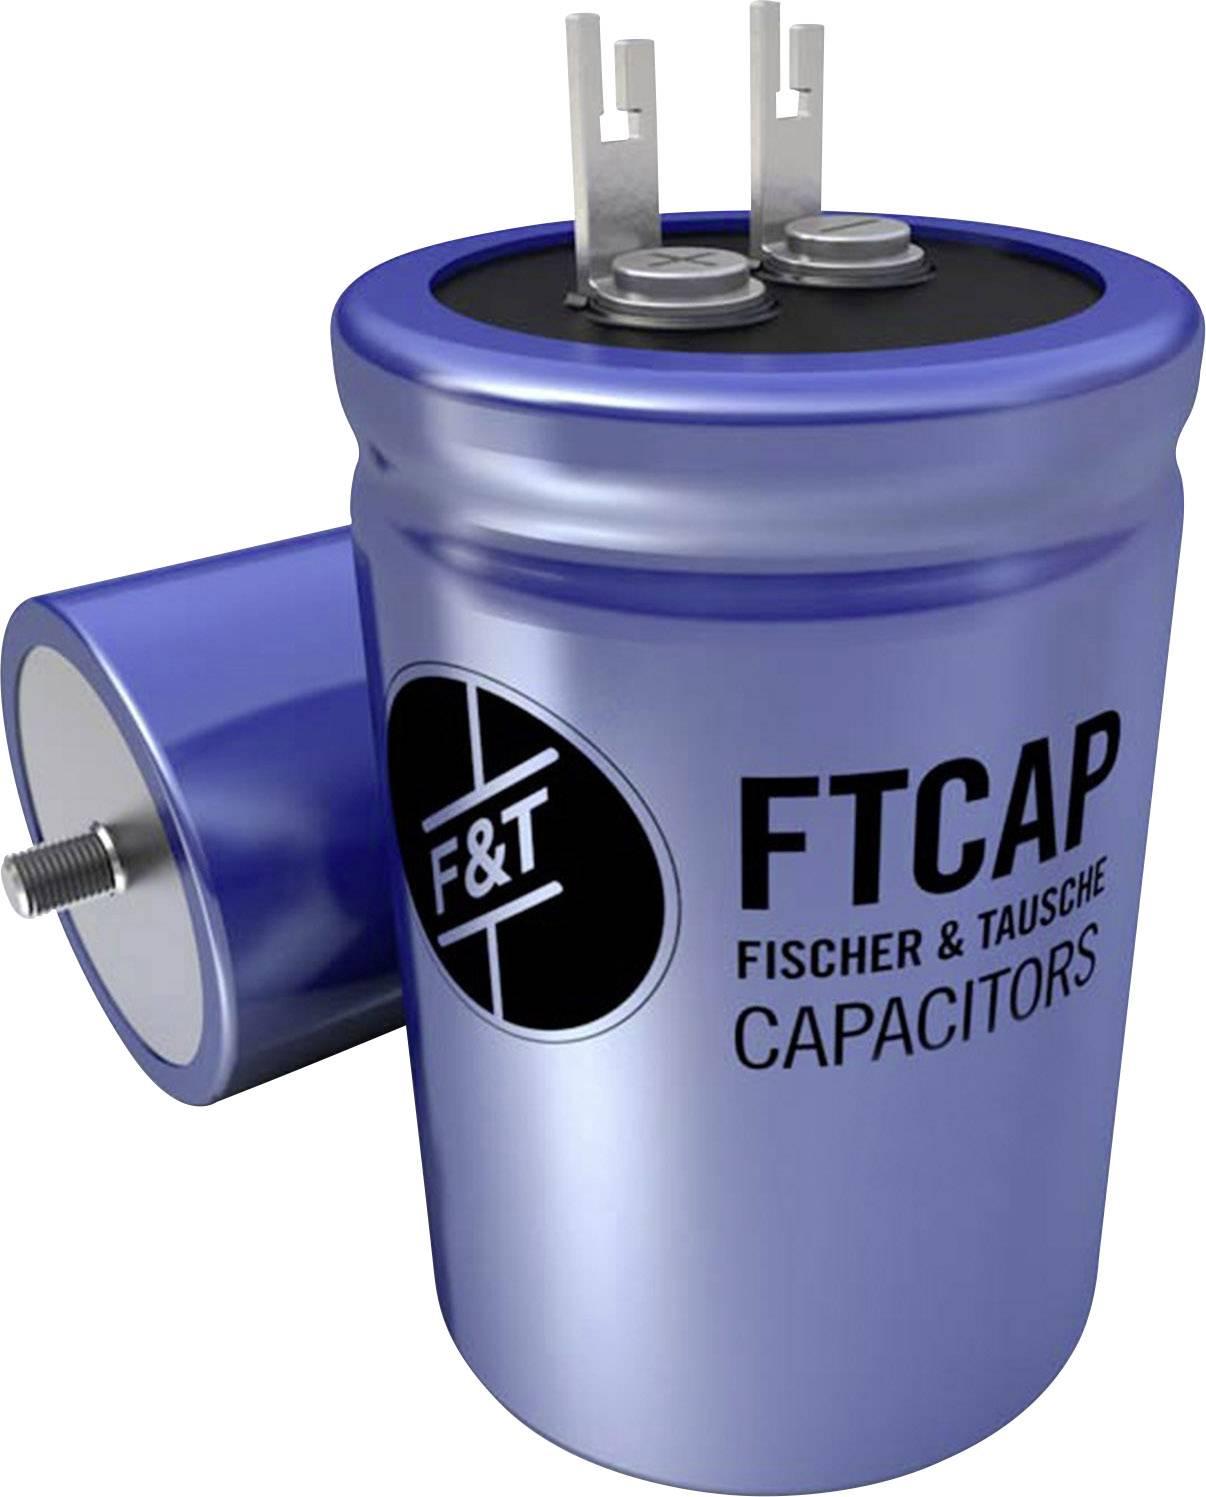 Elektrolytický kondenzátor FTCAP LFB 508 35X70, 10000 µF, 63 V, 20 %, 1 ks